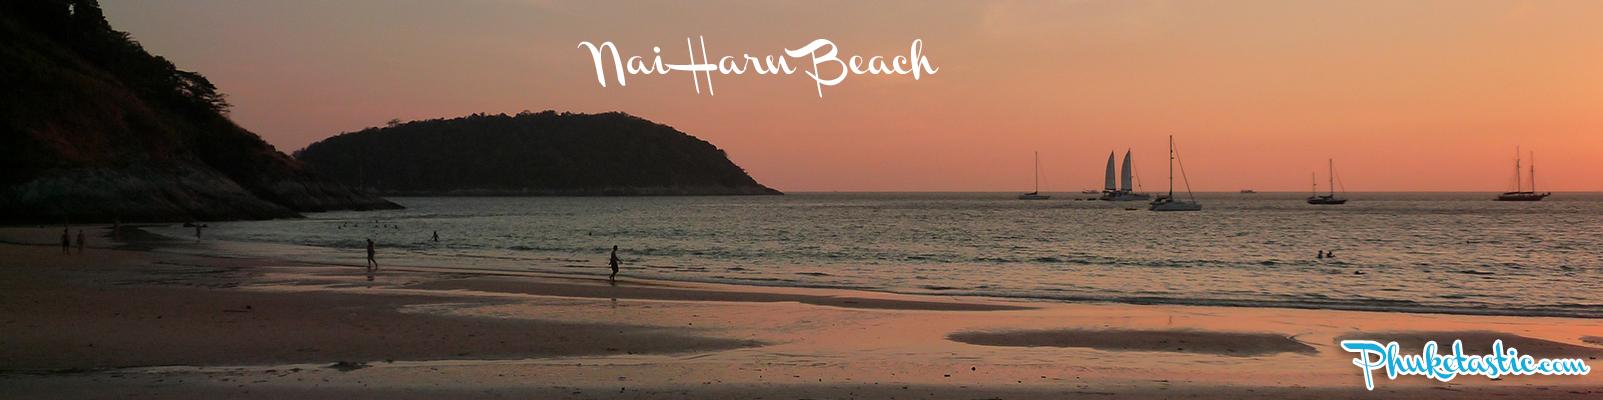 nai-harn-beach